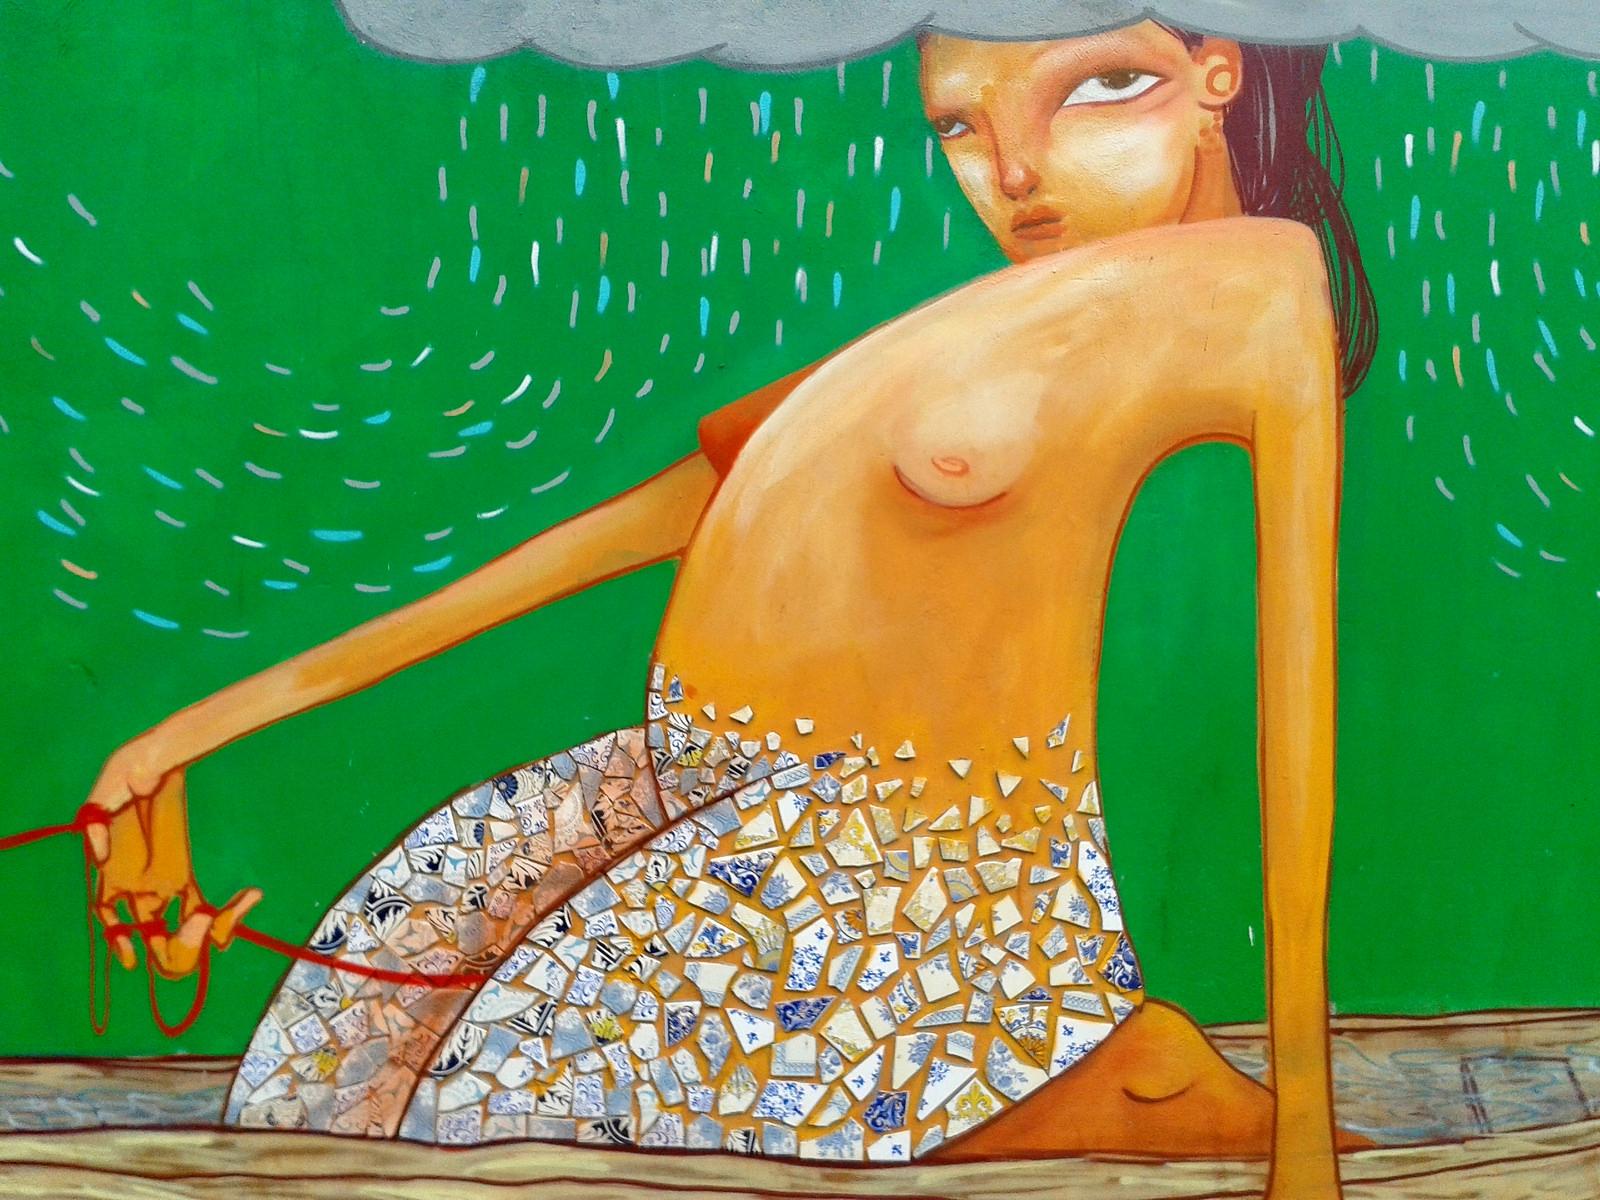 magrela-a-new-piece-in-sao-paulo-brasil-03